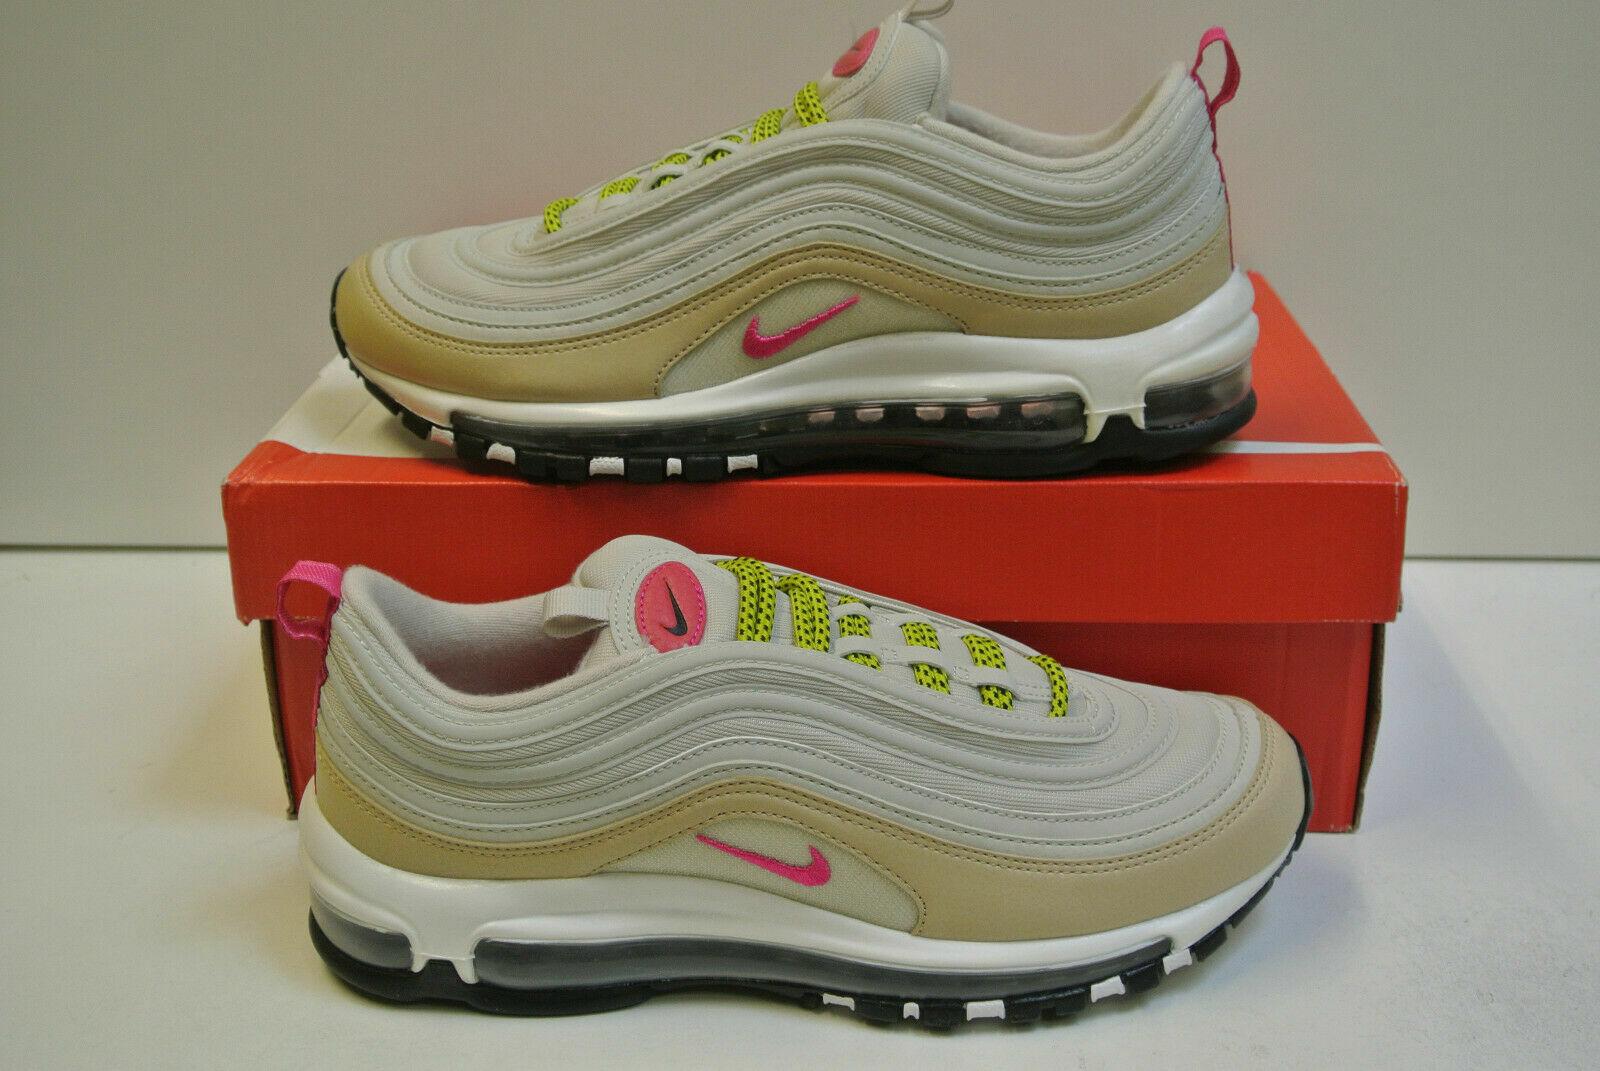 WMNS Nike Air Max 97  Größe 41 US 9,5  Neu & OVP